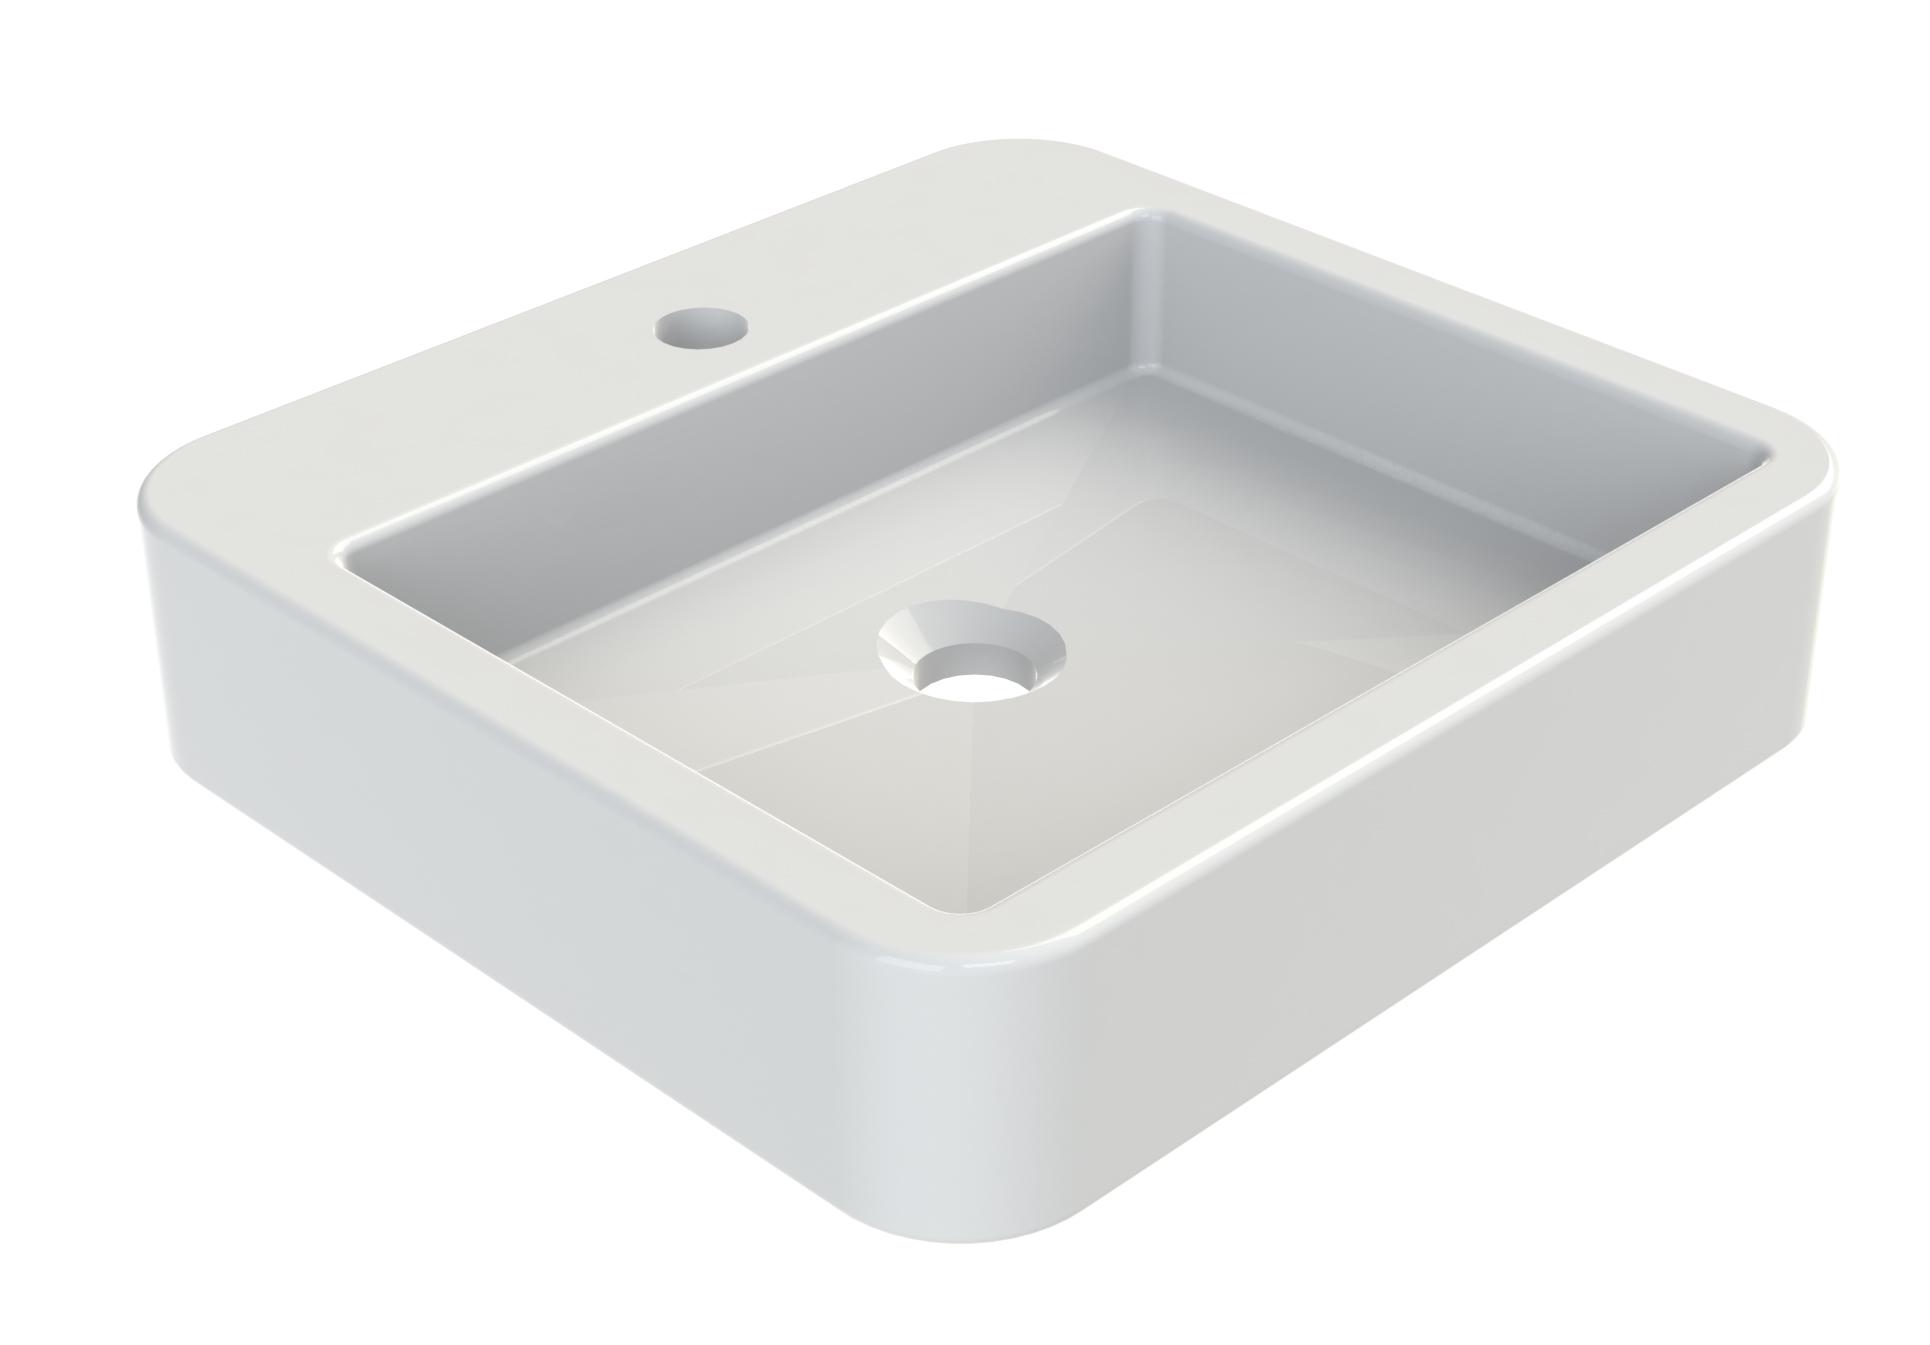 vasque poser en c ramique carr e vasque poser carr e melkia aquarine. Black Bedroom Furniture Sets. Home Design Ideas